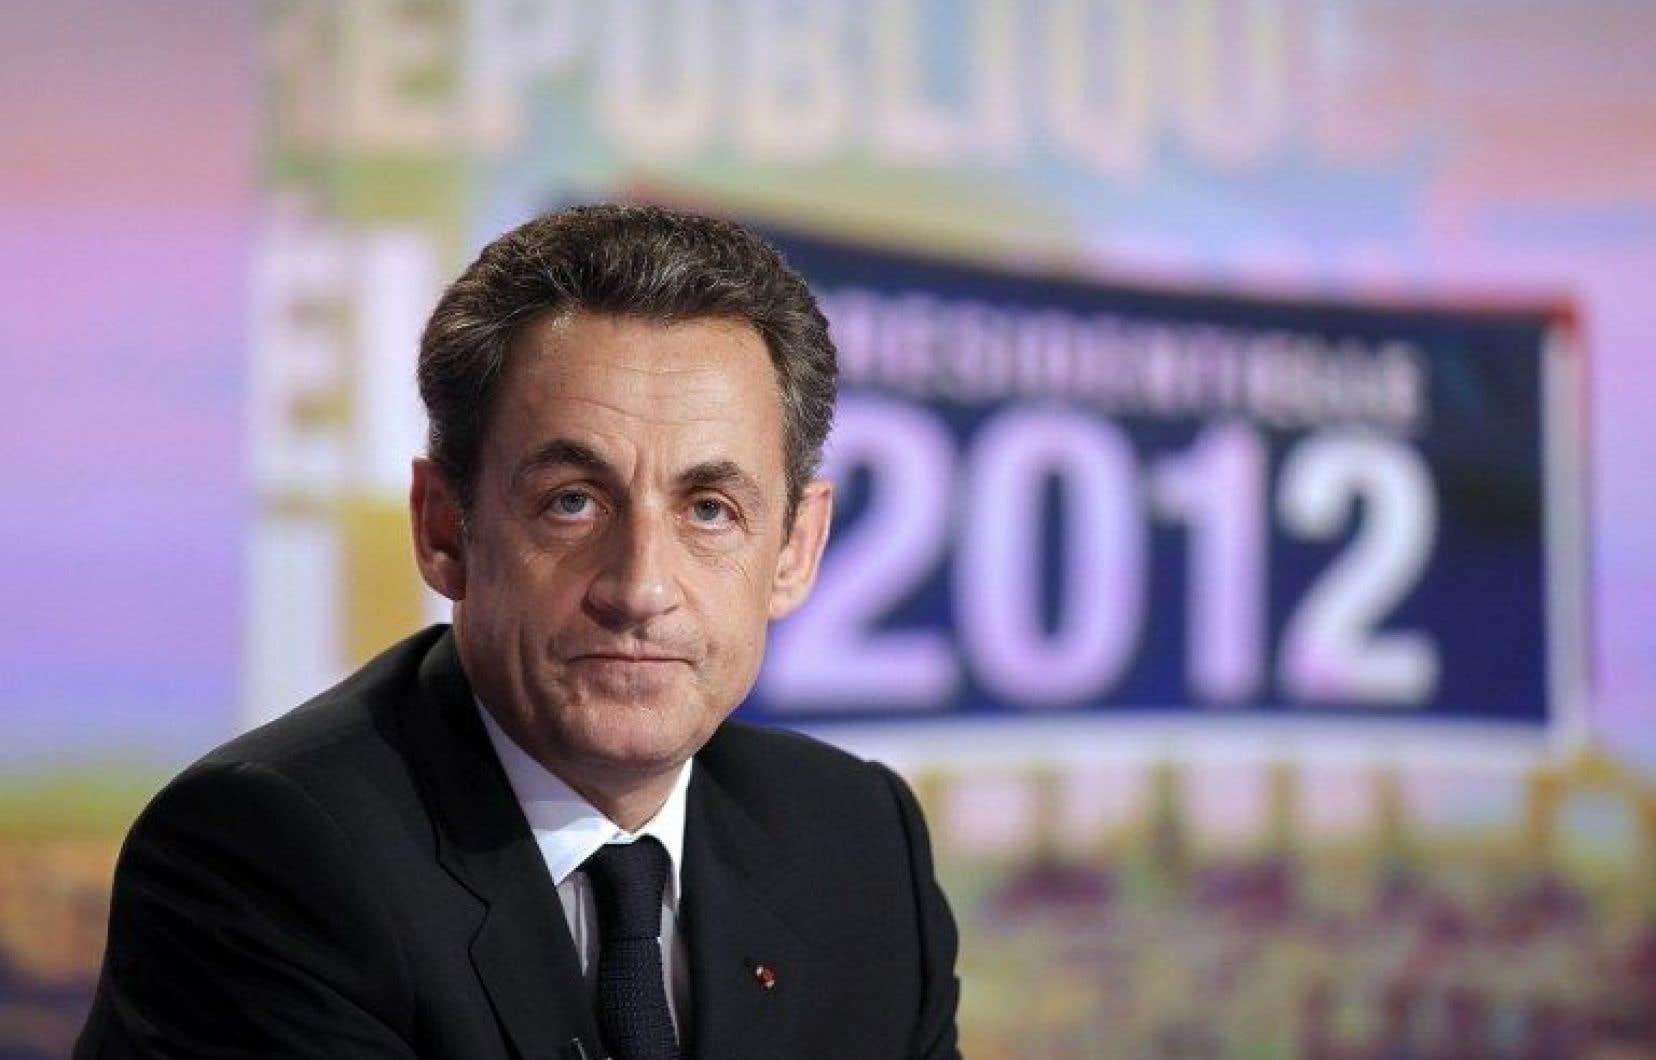 L'ex-président de droite français Nicolas Sarkozy